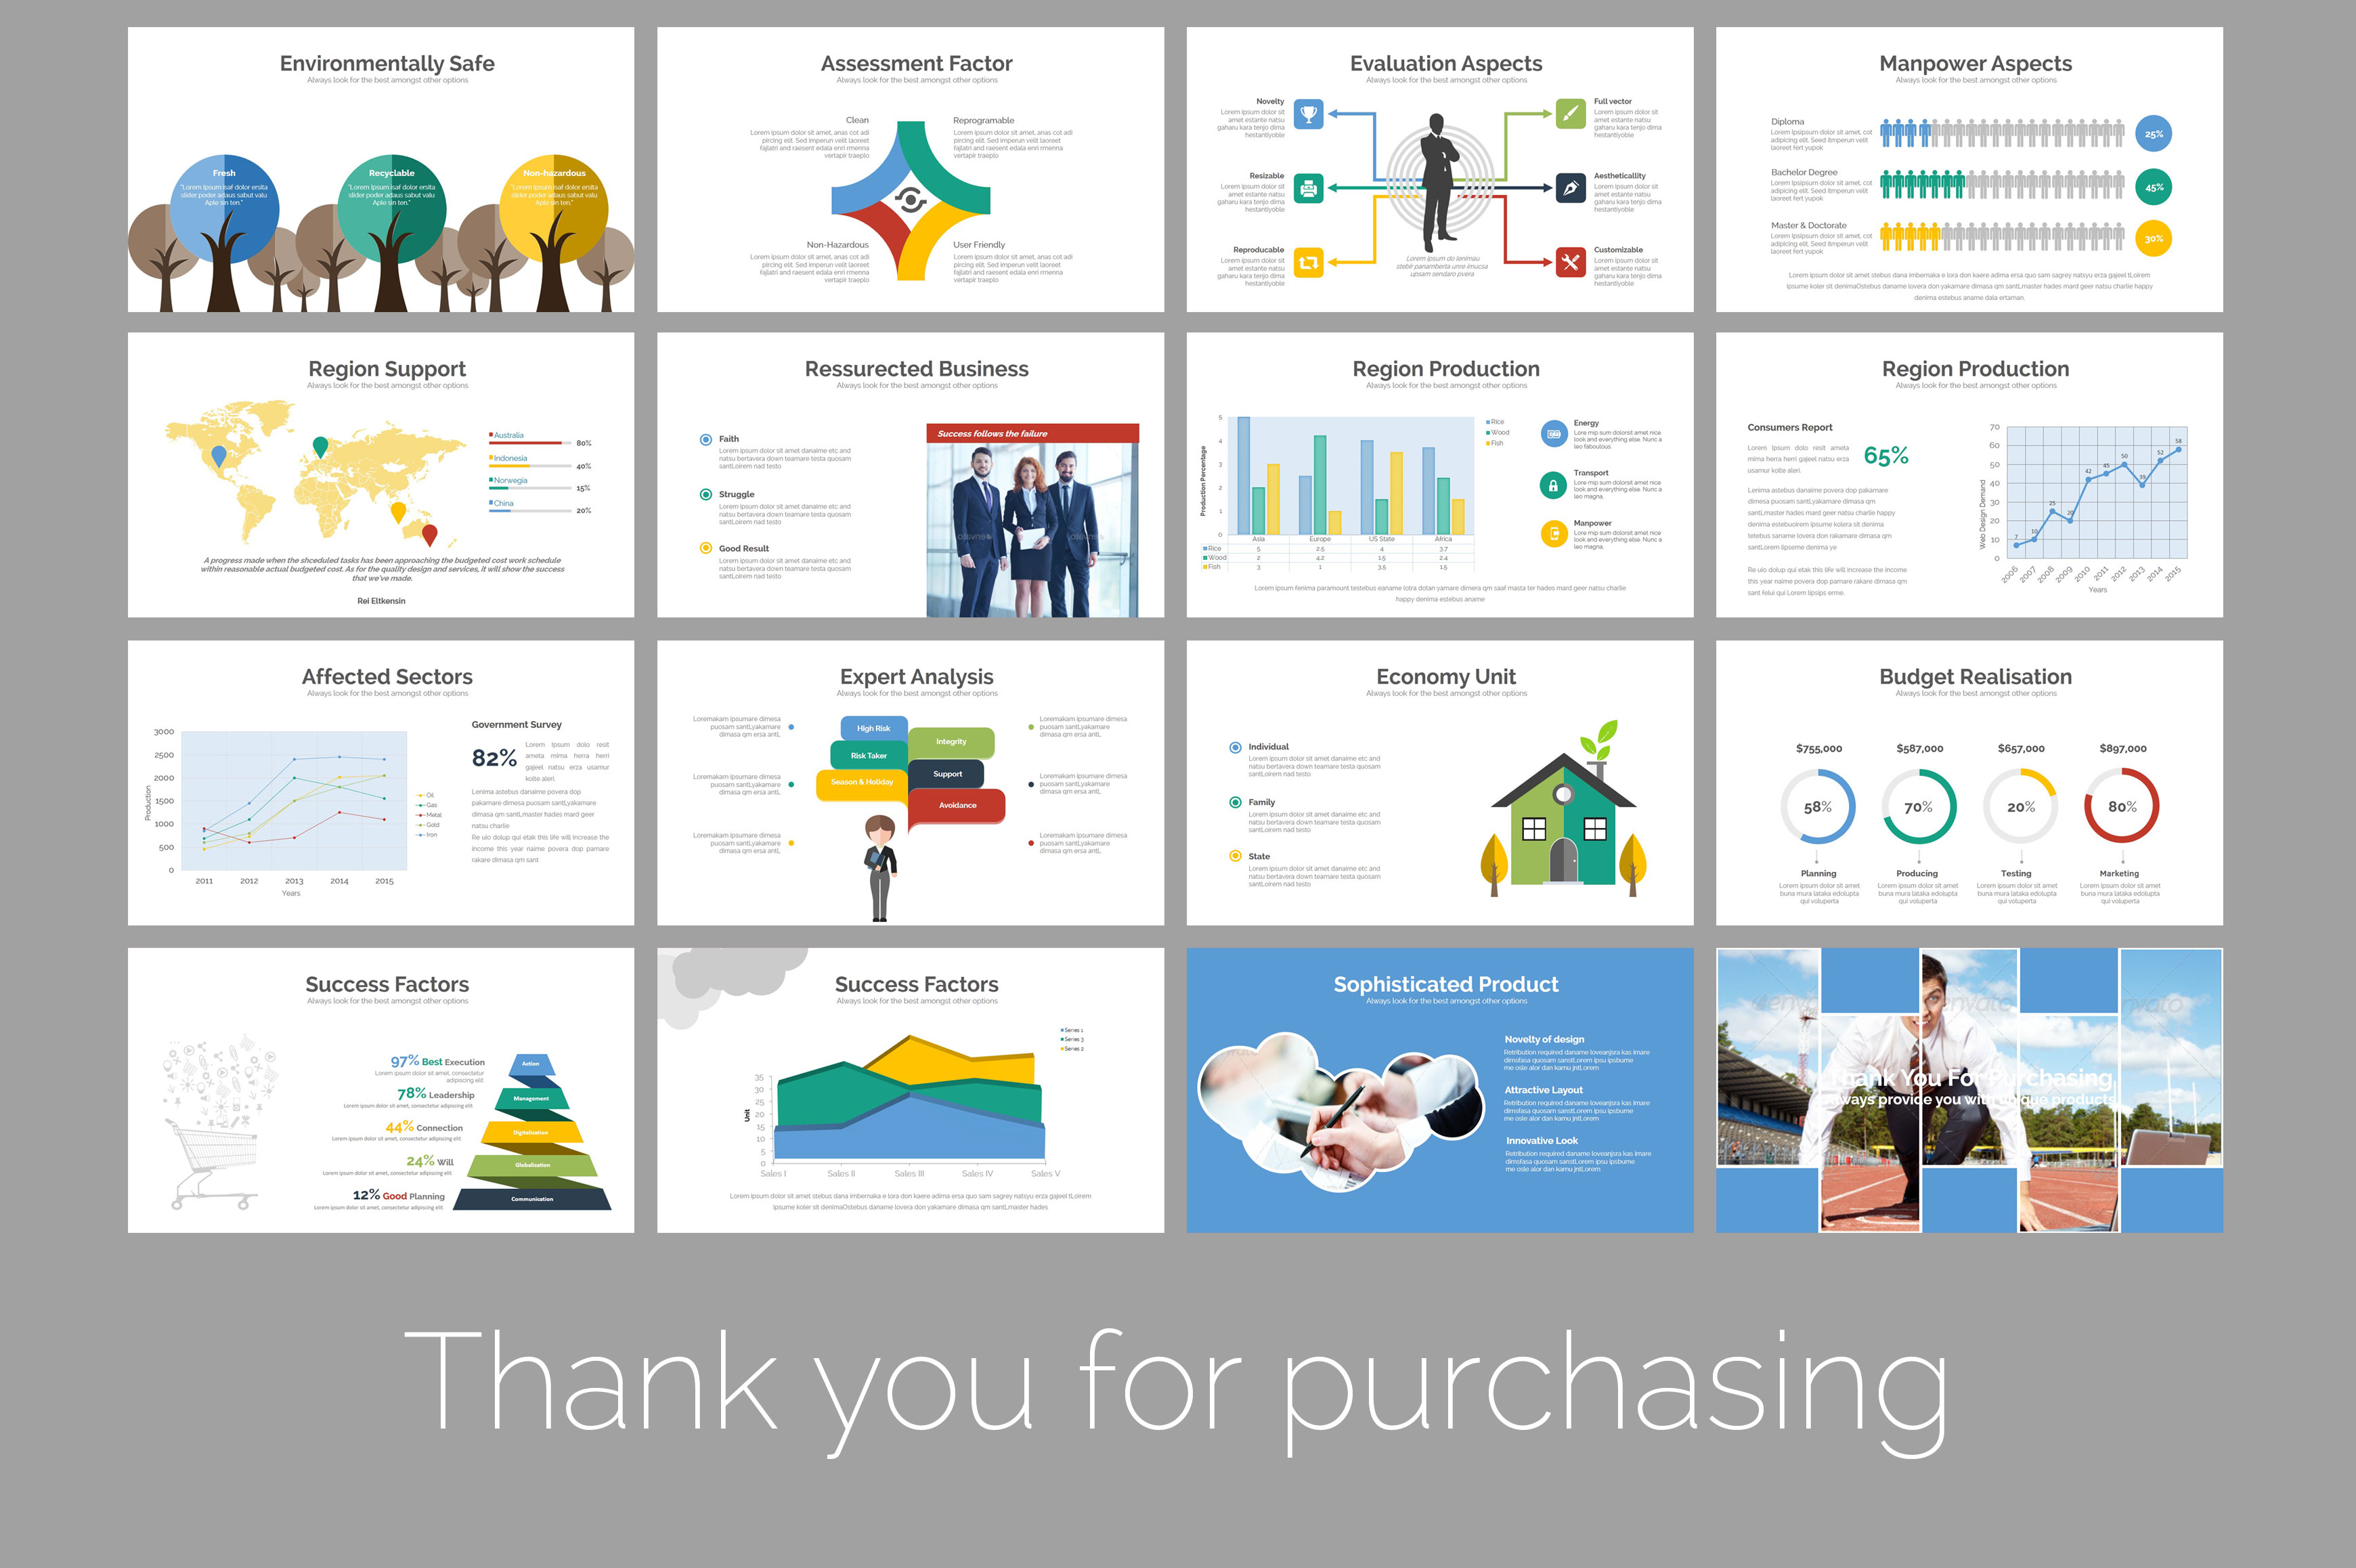 pecha kucha powerpoint template - brillian powerpoint presentation presentation